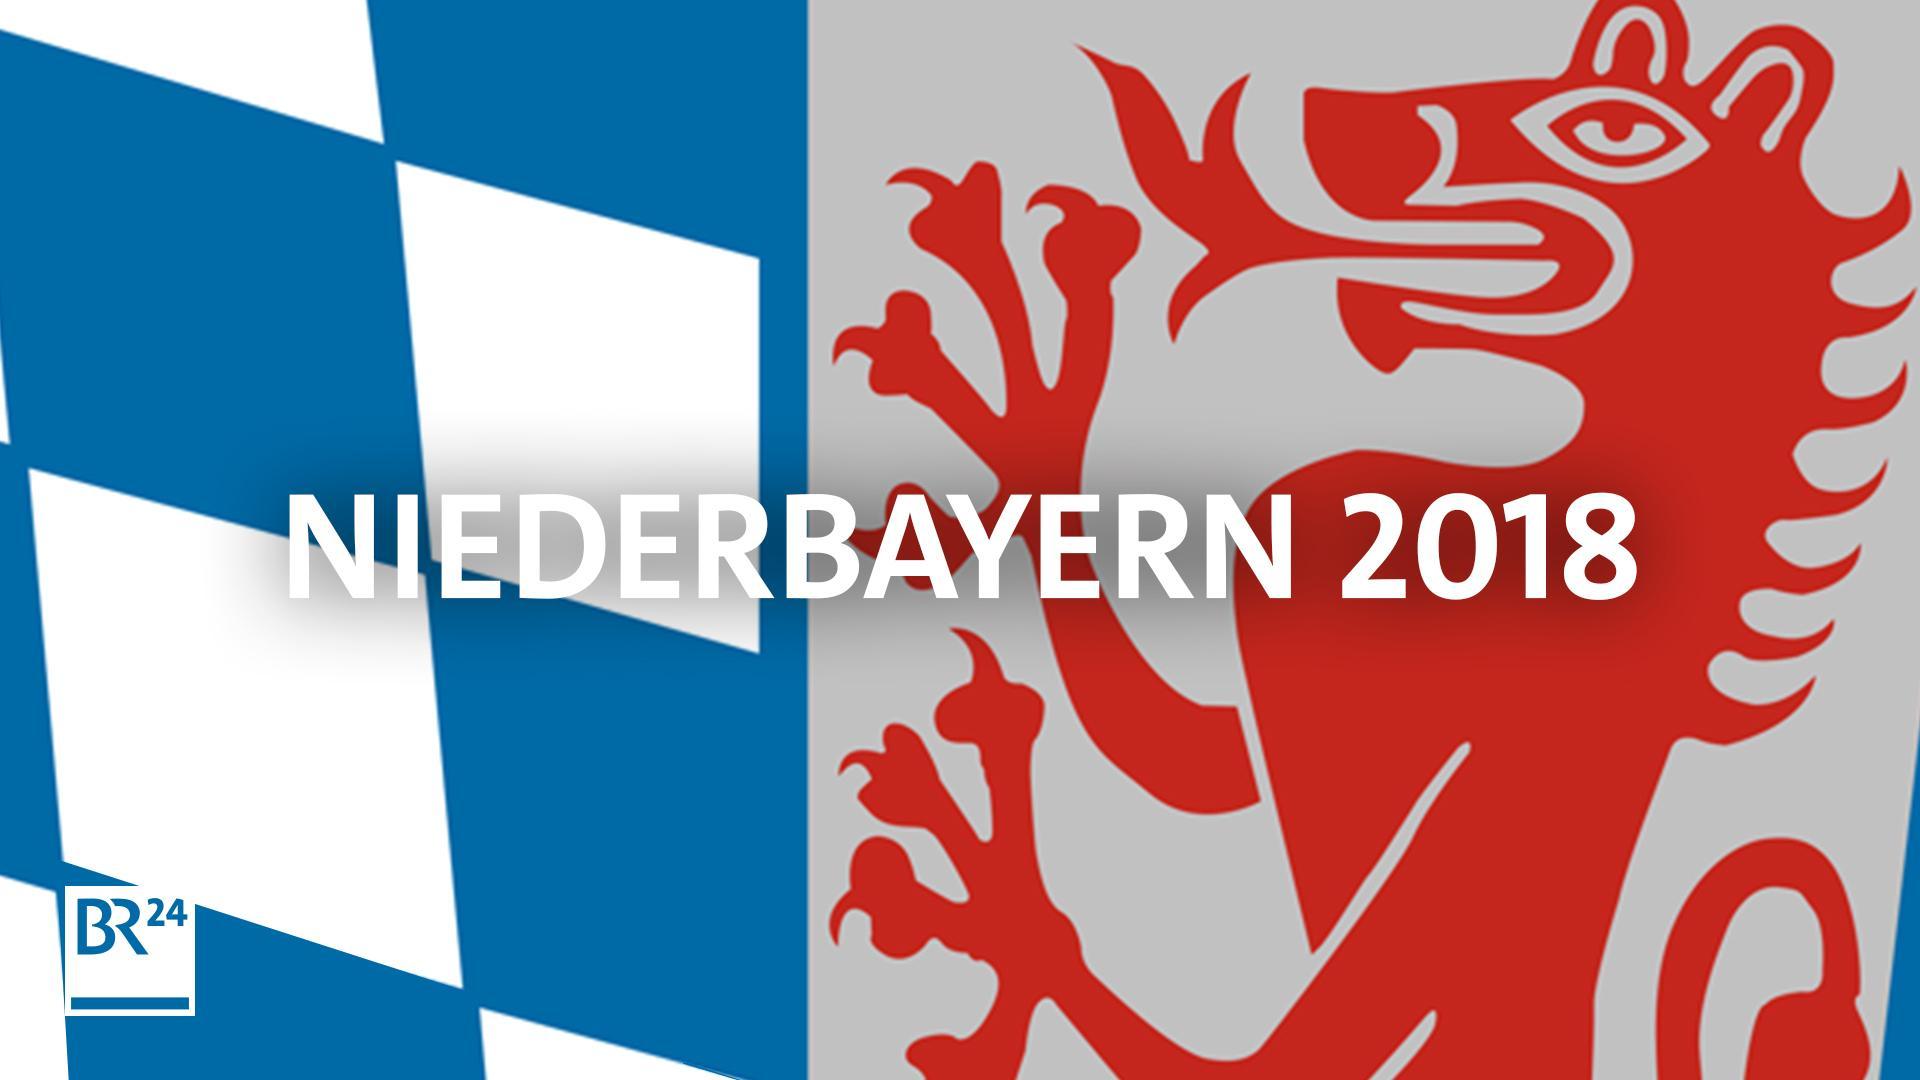 Niederbayern 2018